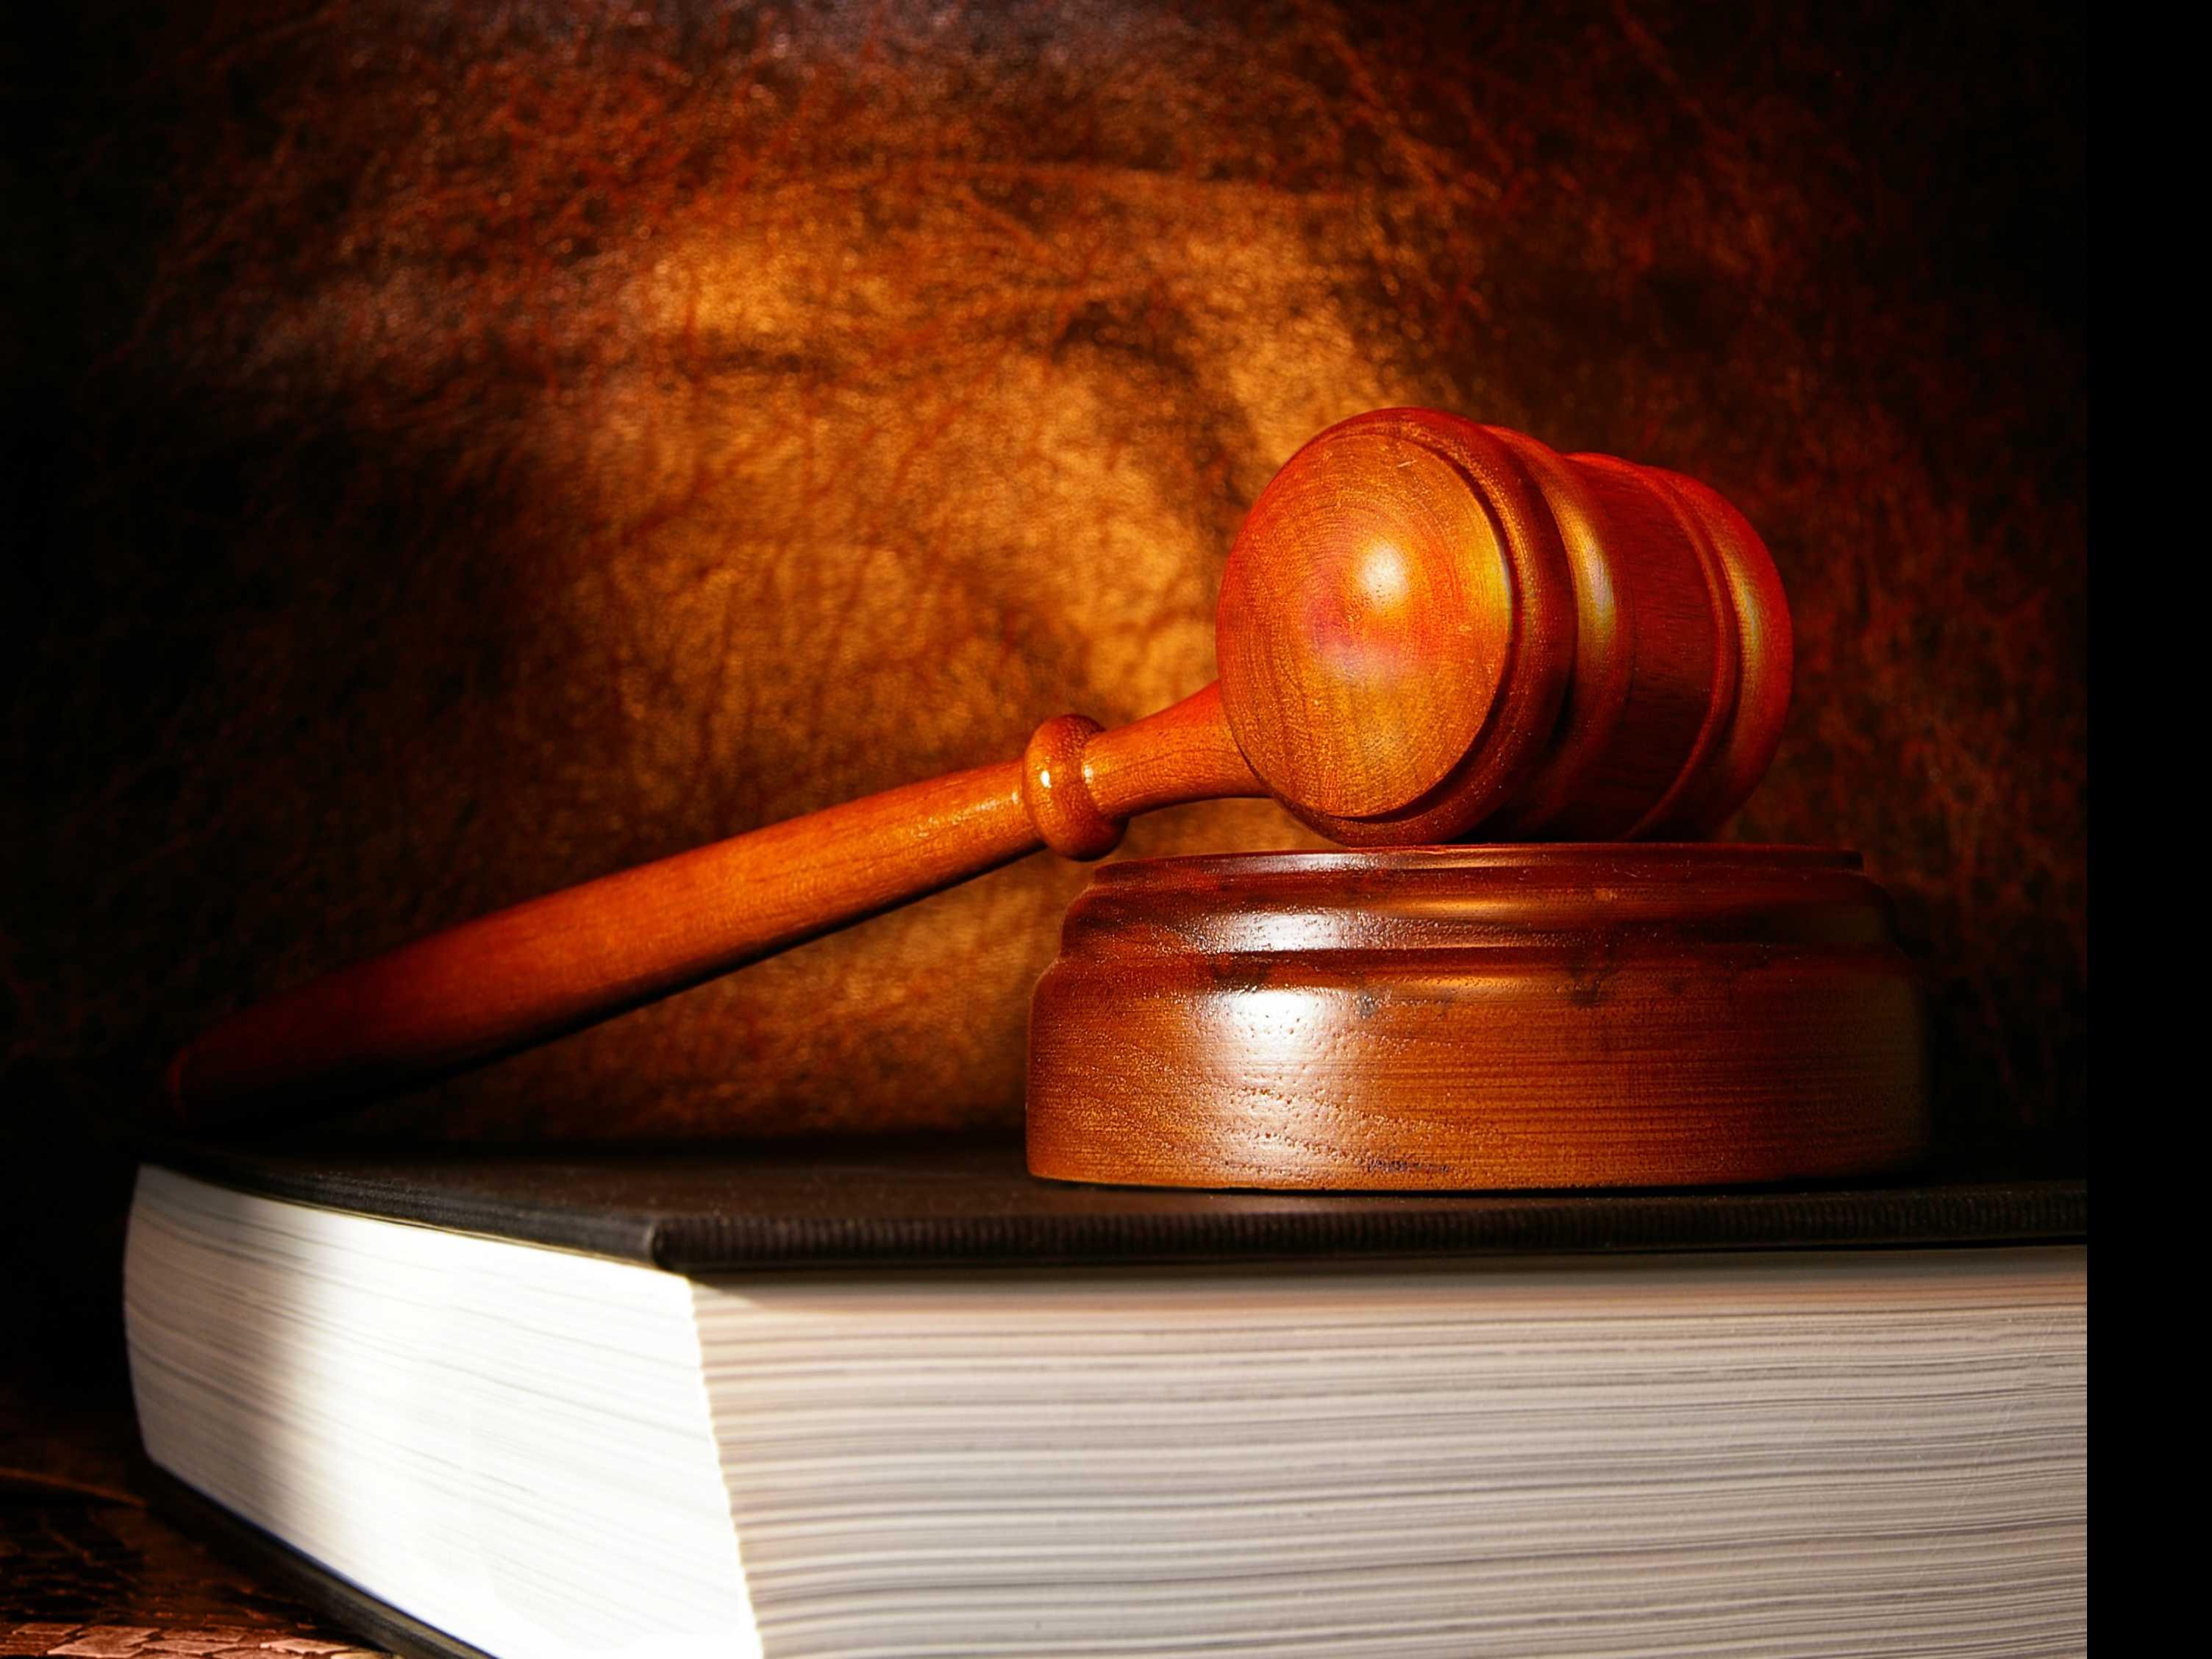 Louisiana Marriage Law Requiring Birth Certificates Blocked